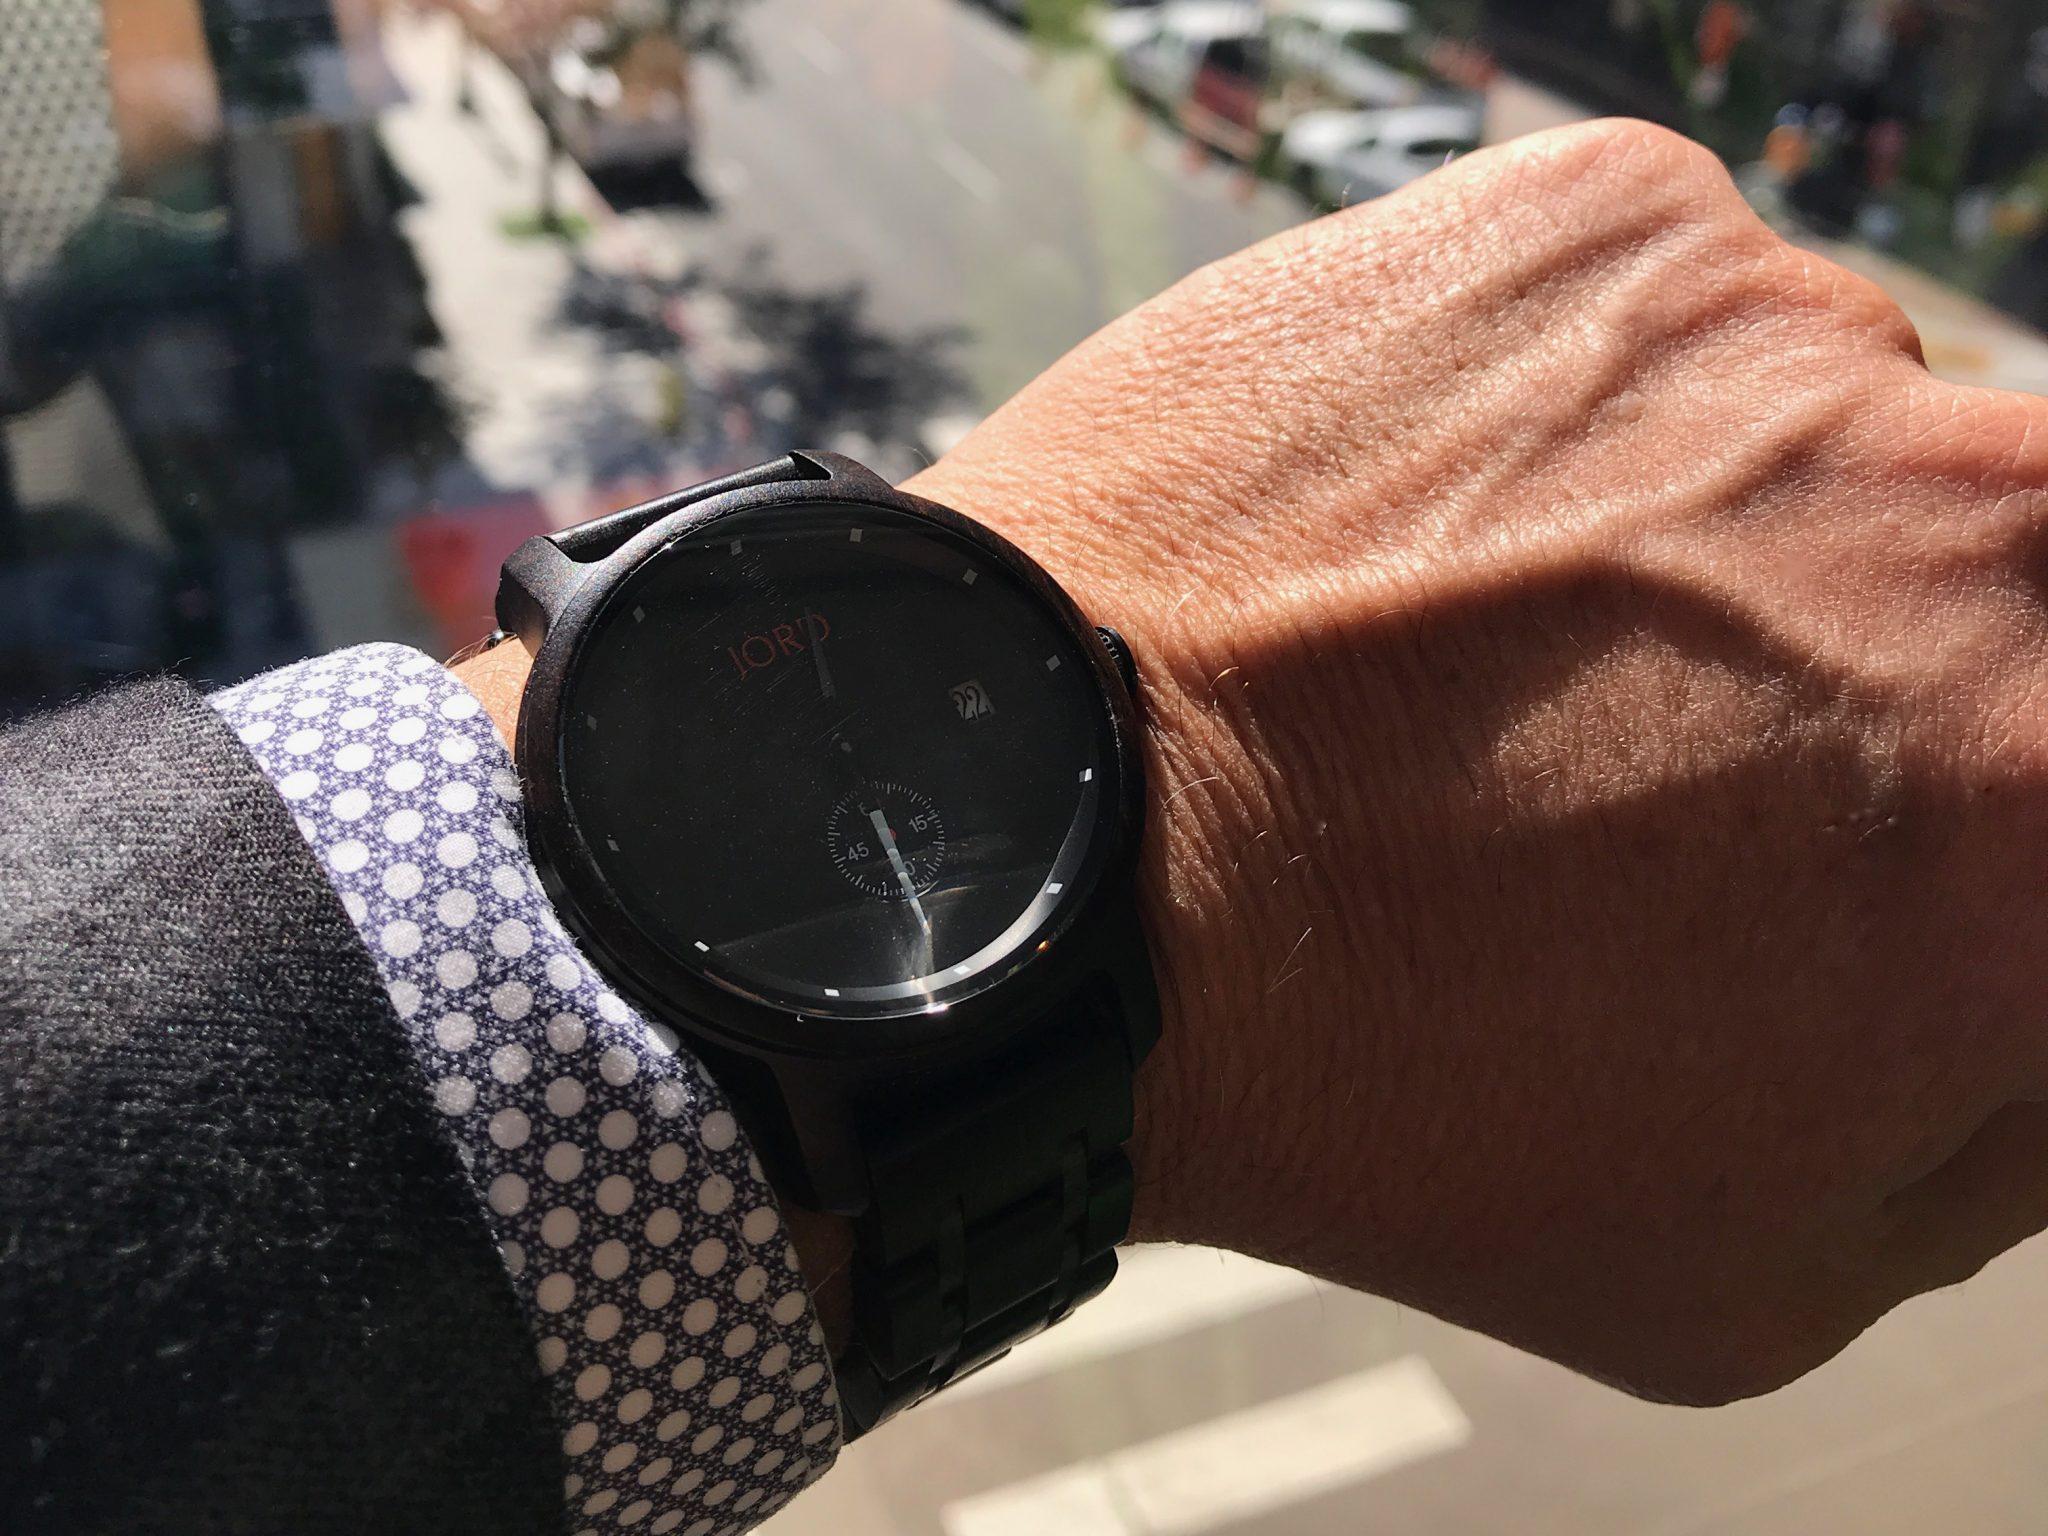 JORD ebony wood watch at work